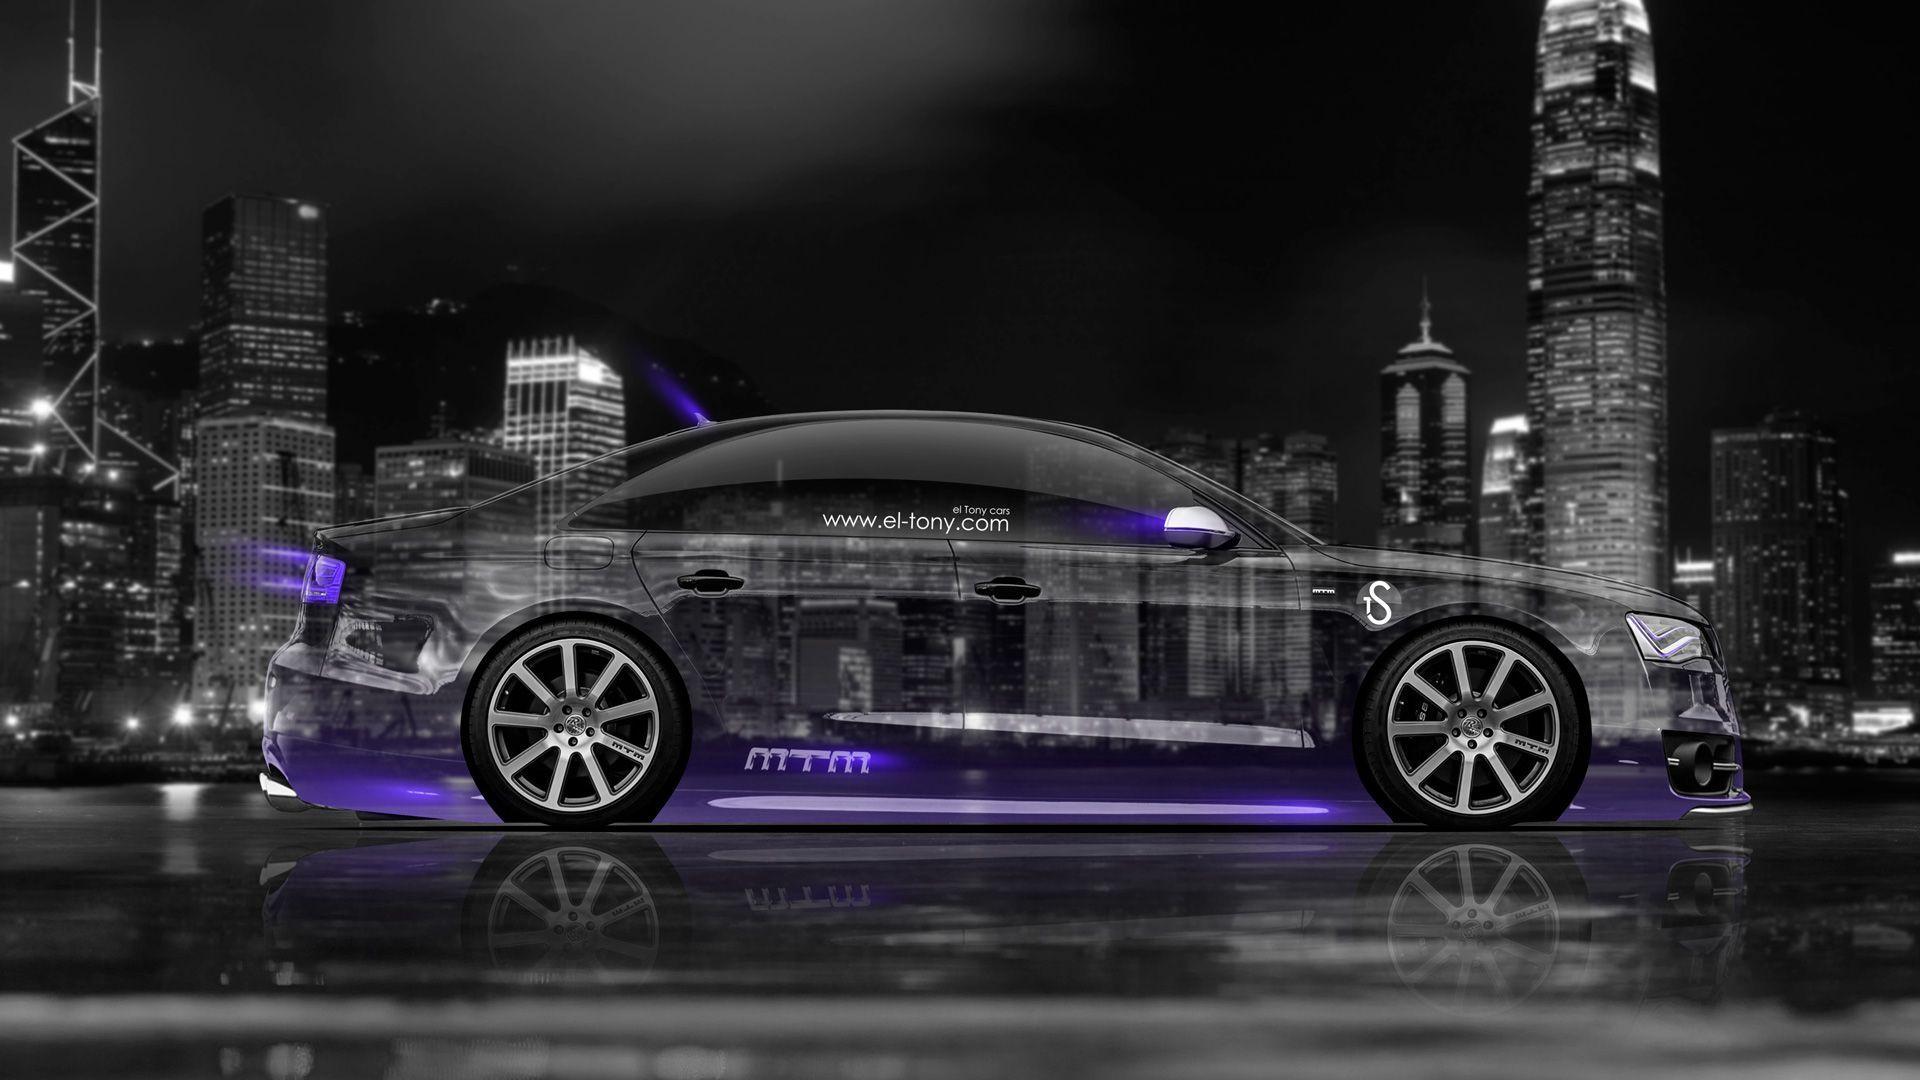 Audi S8 Wallpapers 4k Hd Desktop Backgrounds Phone Images .